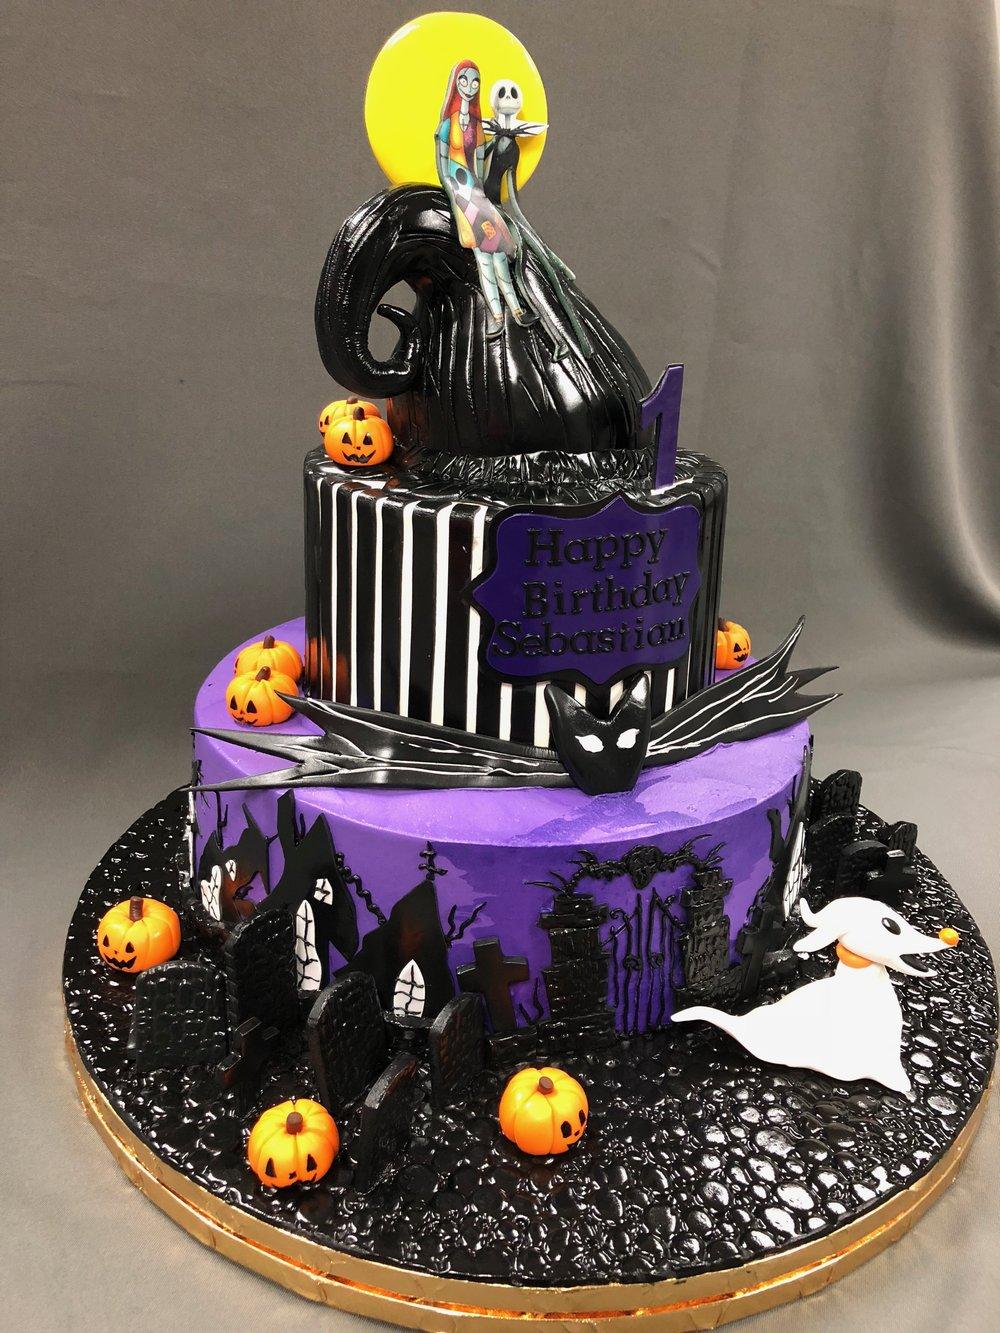 The Nightmare Before Christmas Theme 1st Birthday Cake Skazka Desserts Bakery Nj Custom Birthday Cakes Cupcakes Shop